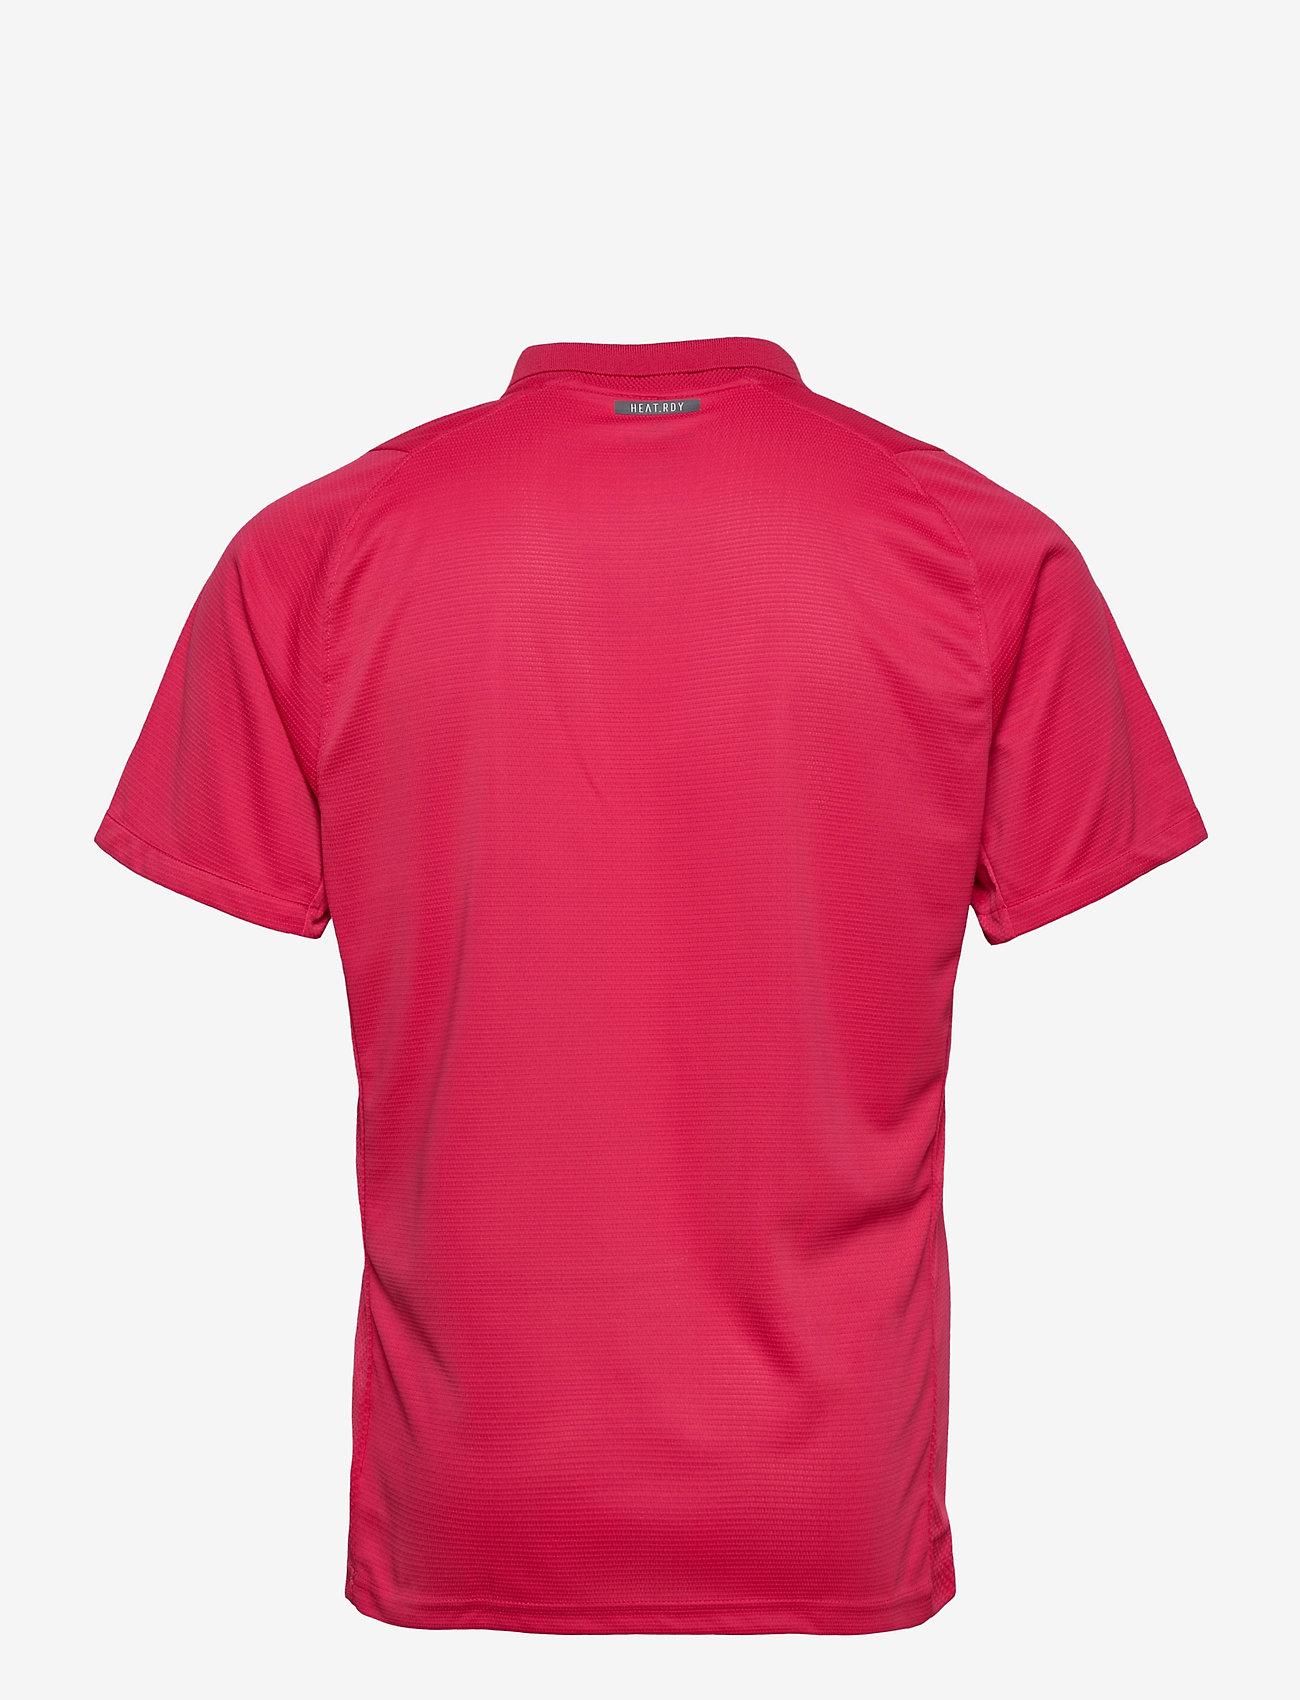 adidas Performance FREELIFT TENNIS POLO SHIRT HEAT.RDY - Poloskjorter PINK - Menn Klær